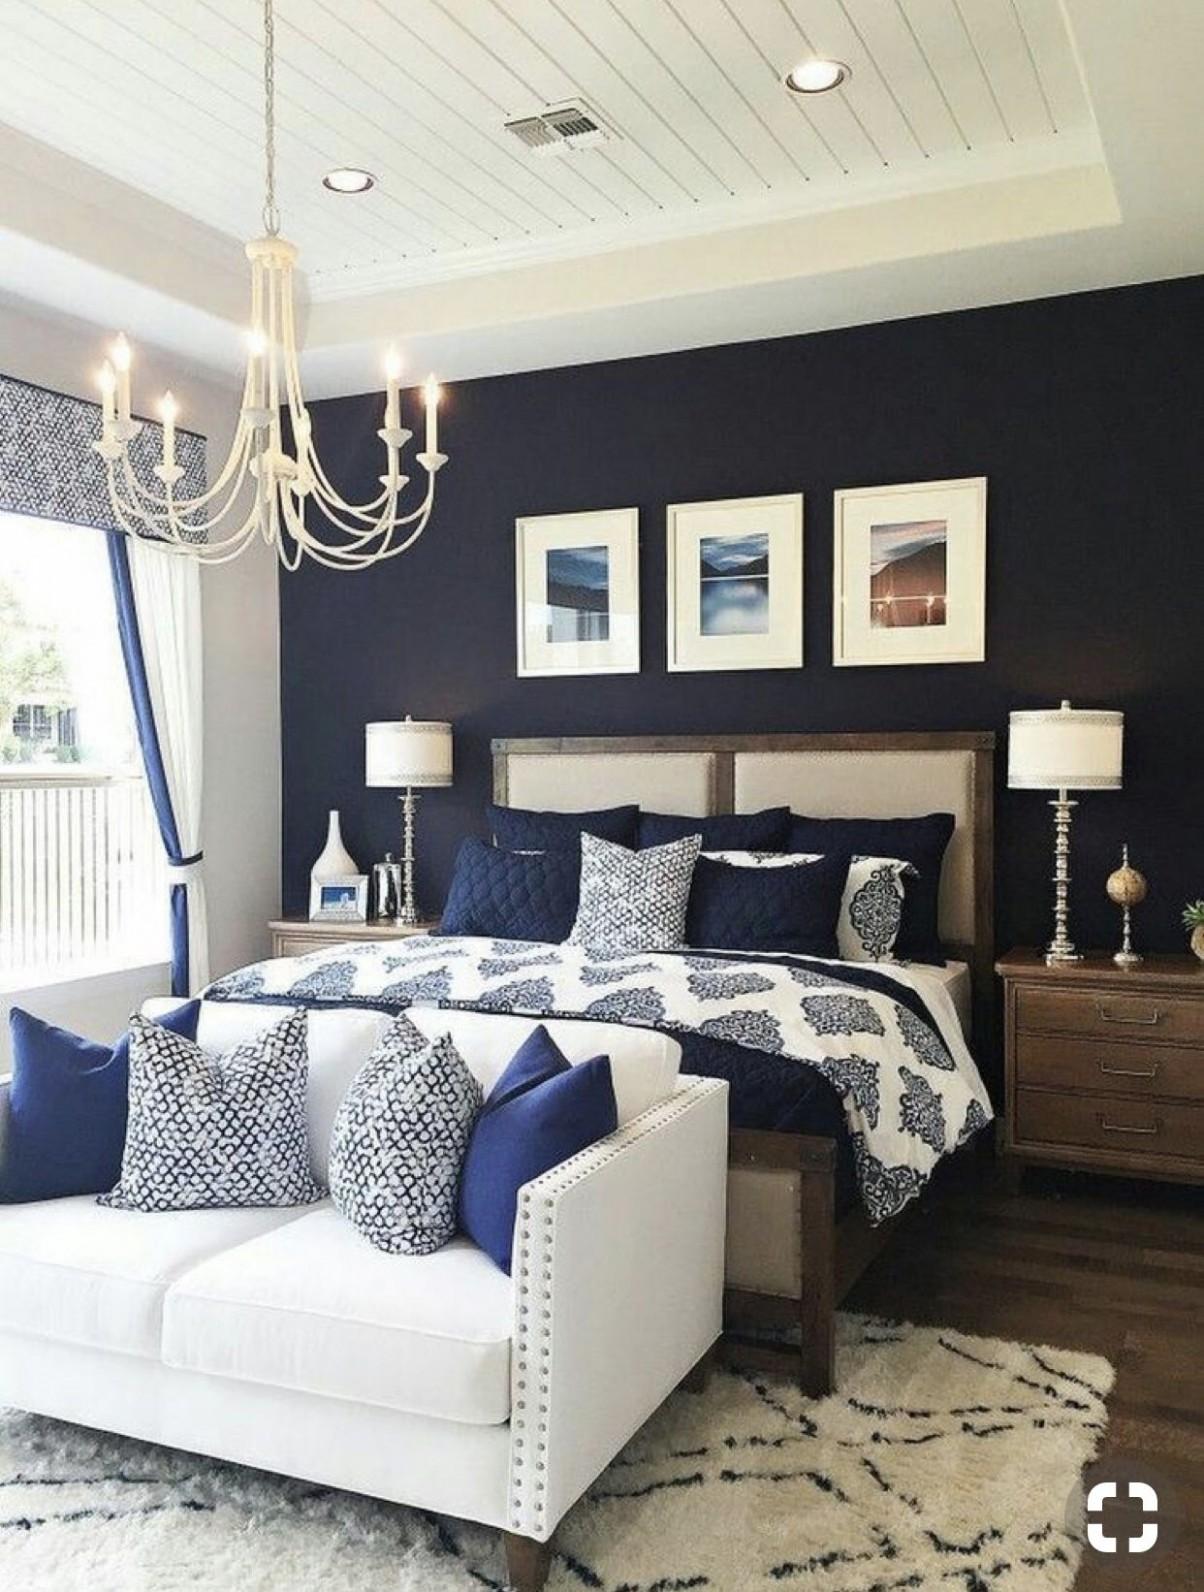 Master bedroom elegance  Small master bedroom, Master bedrooms  - Bedroom Ideas Navy And White